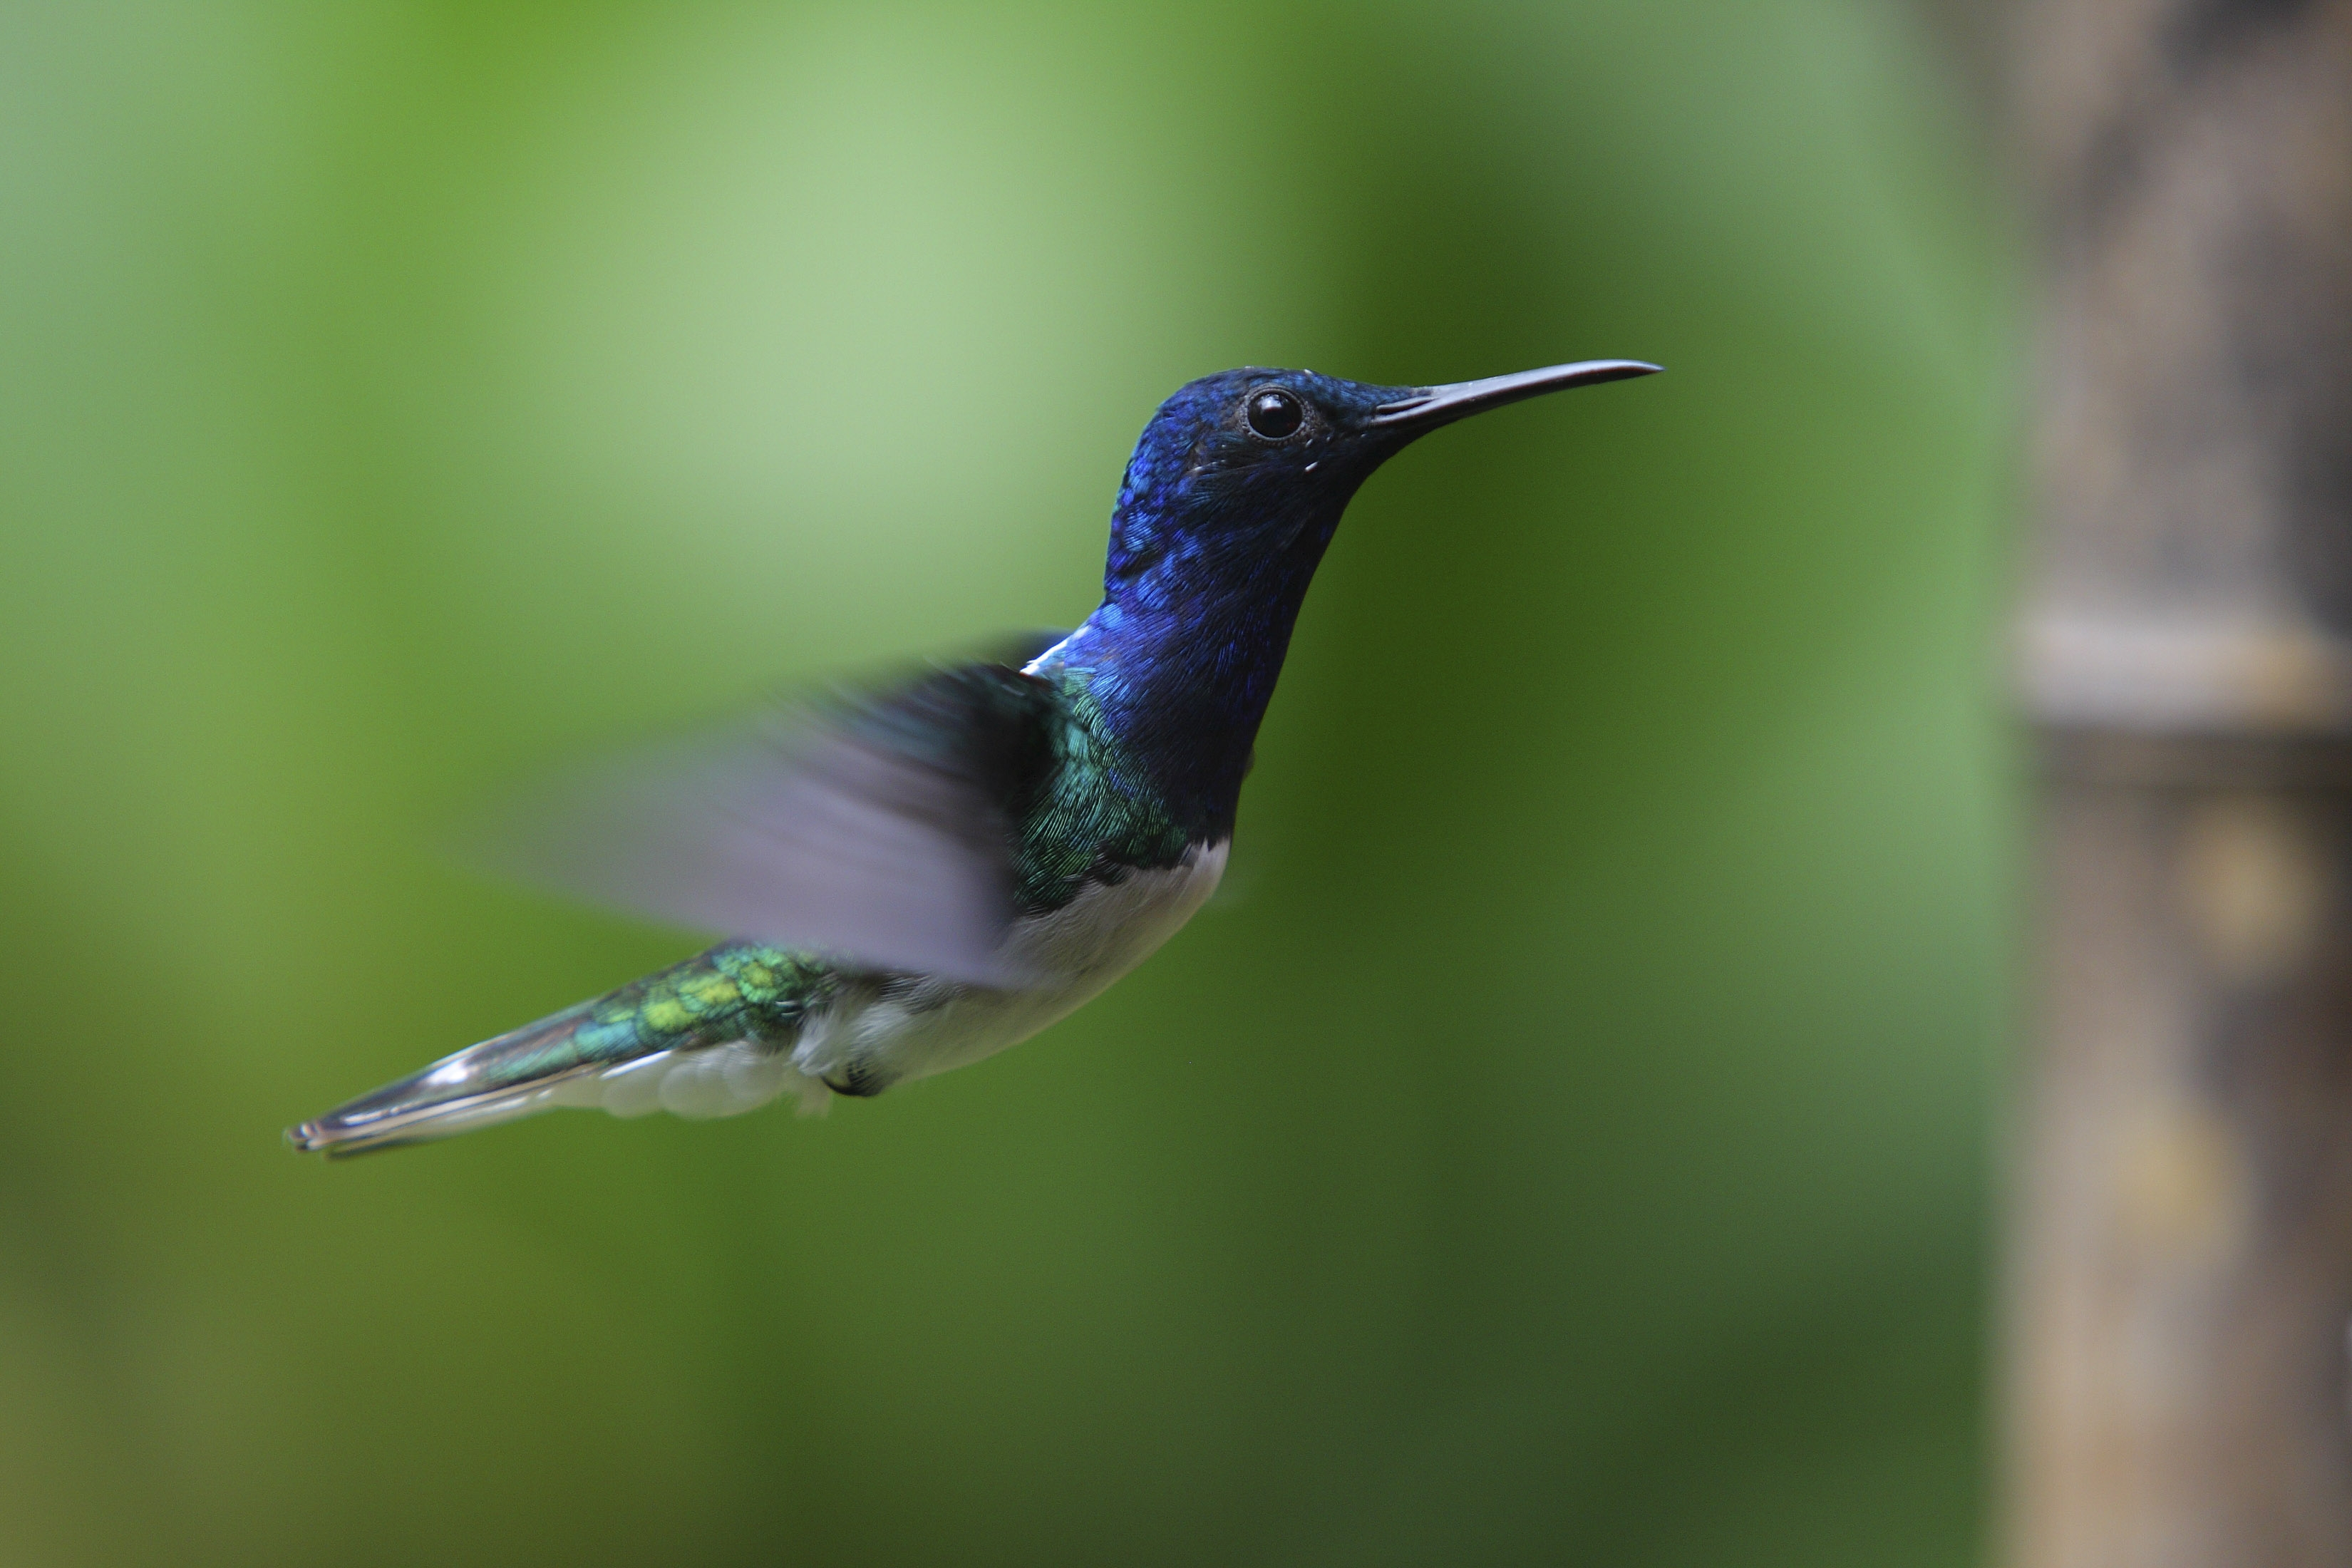 Hummingbird Wallpapers Hd